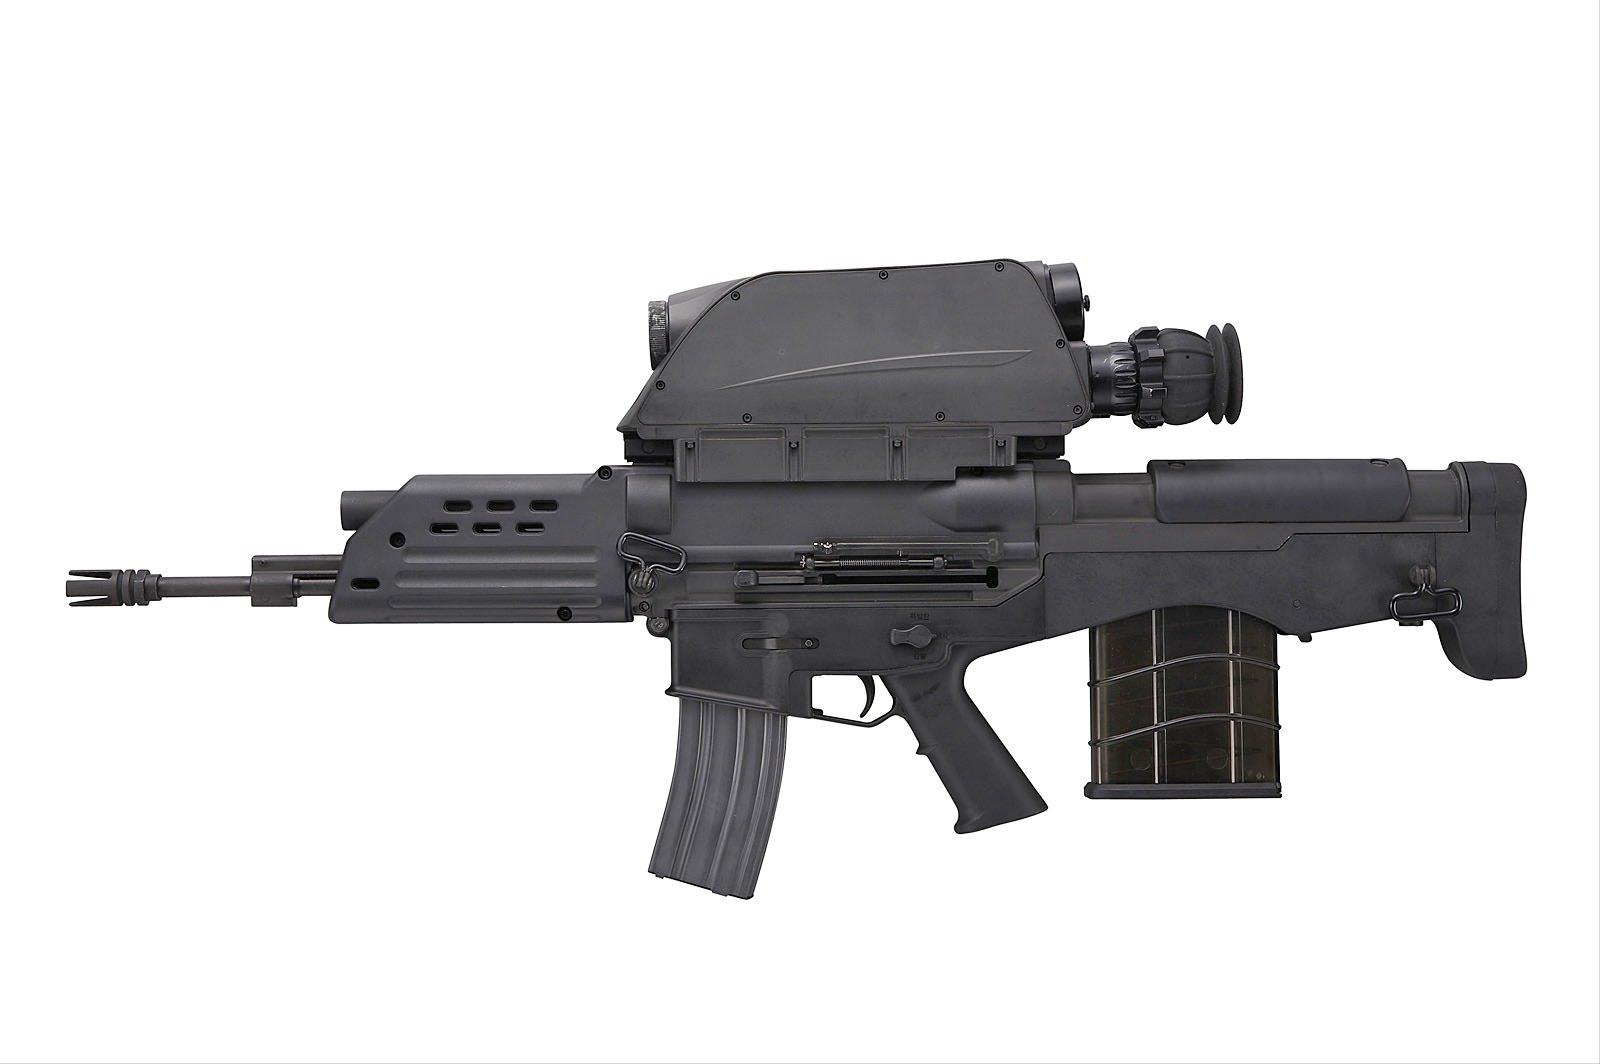 S&T Motiv K11 | Gun Wiki | FANDOM powered by Wikia